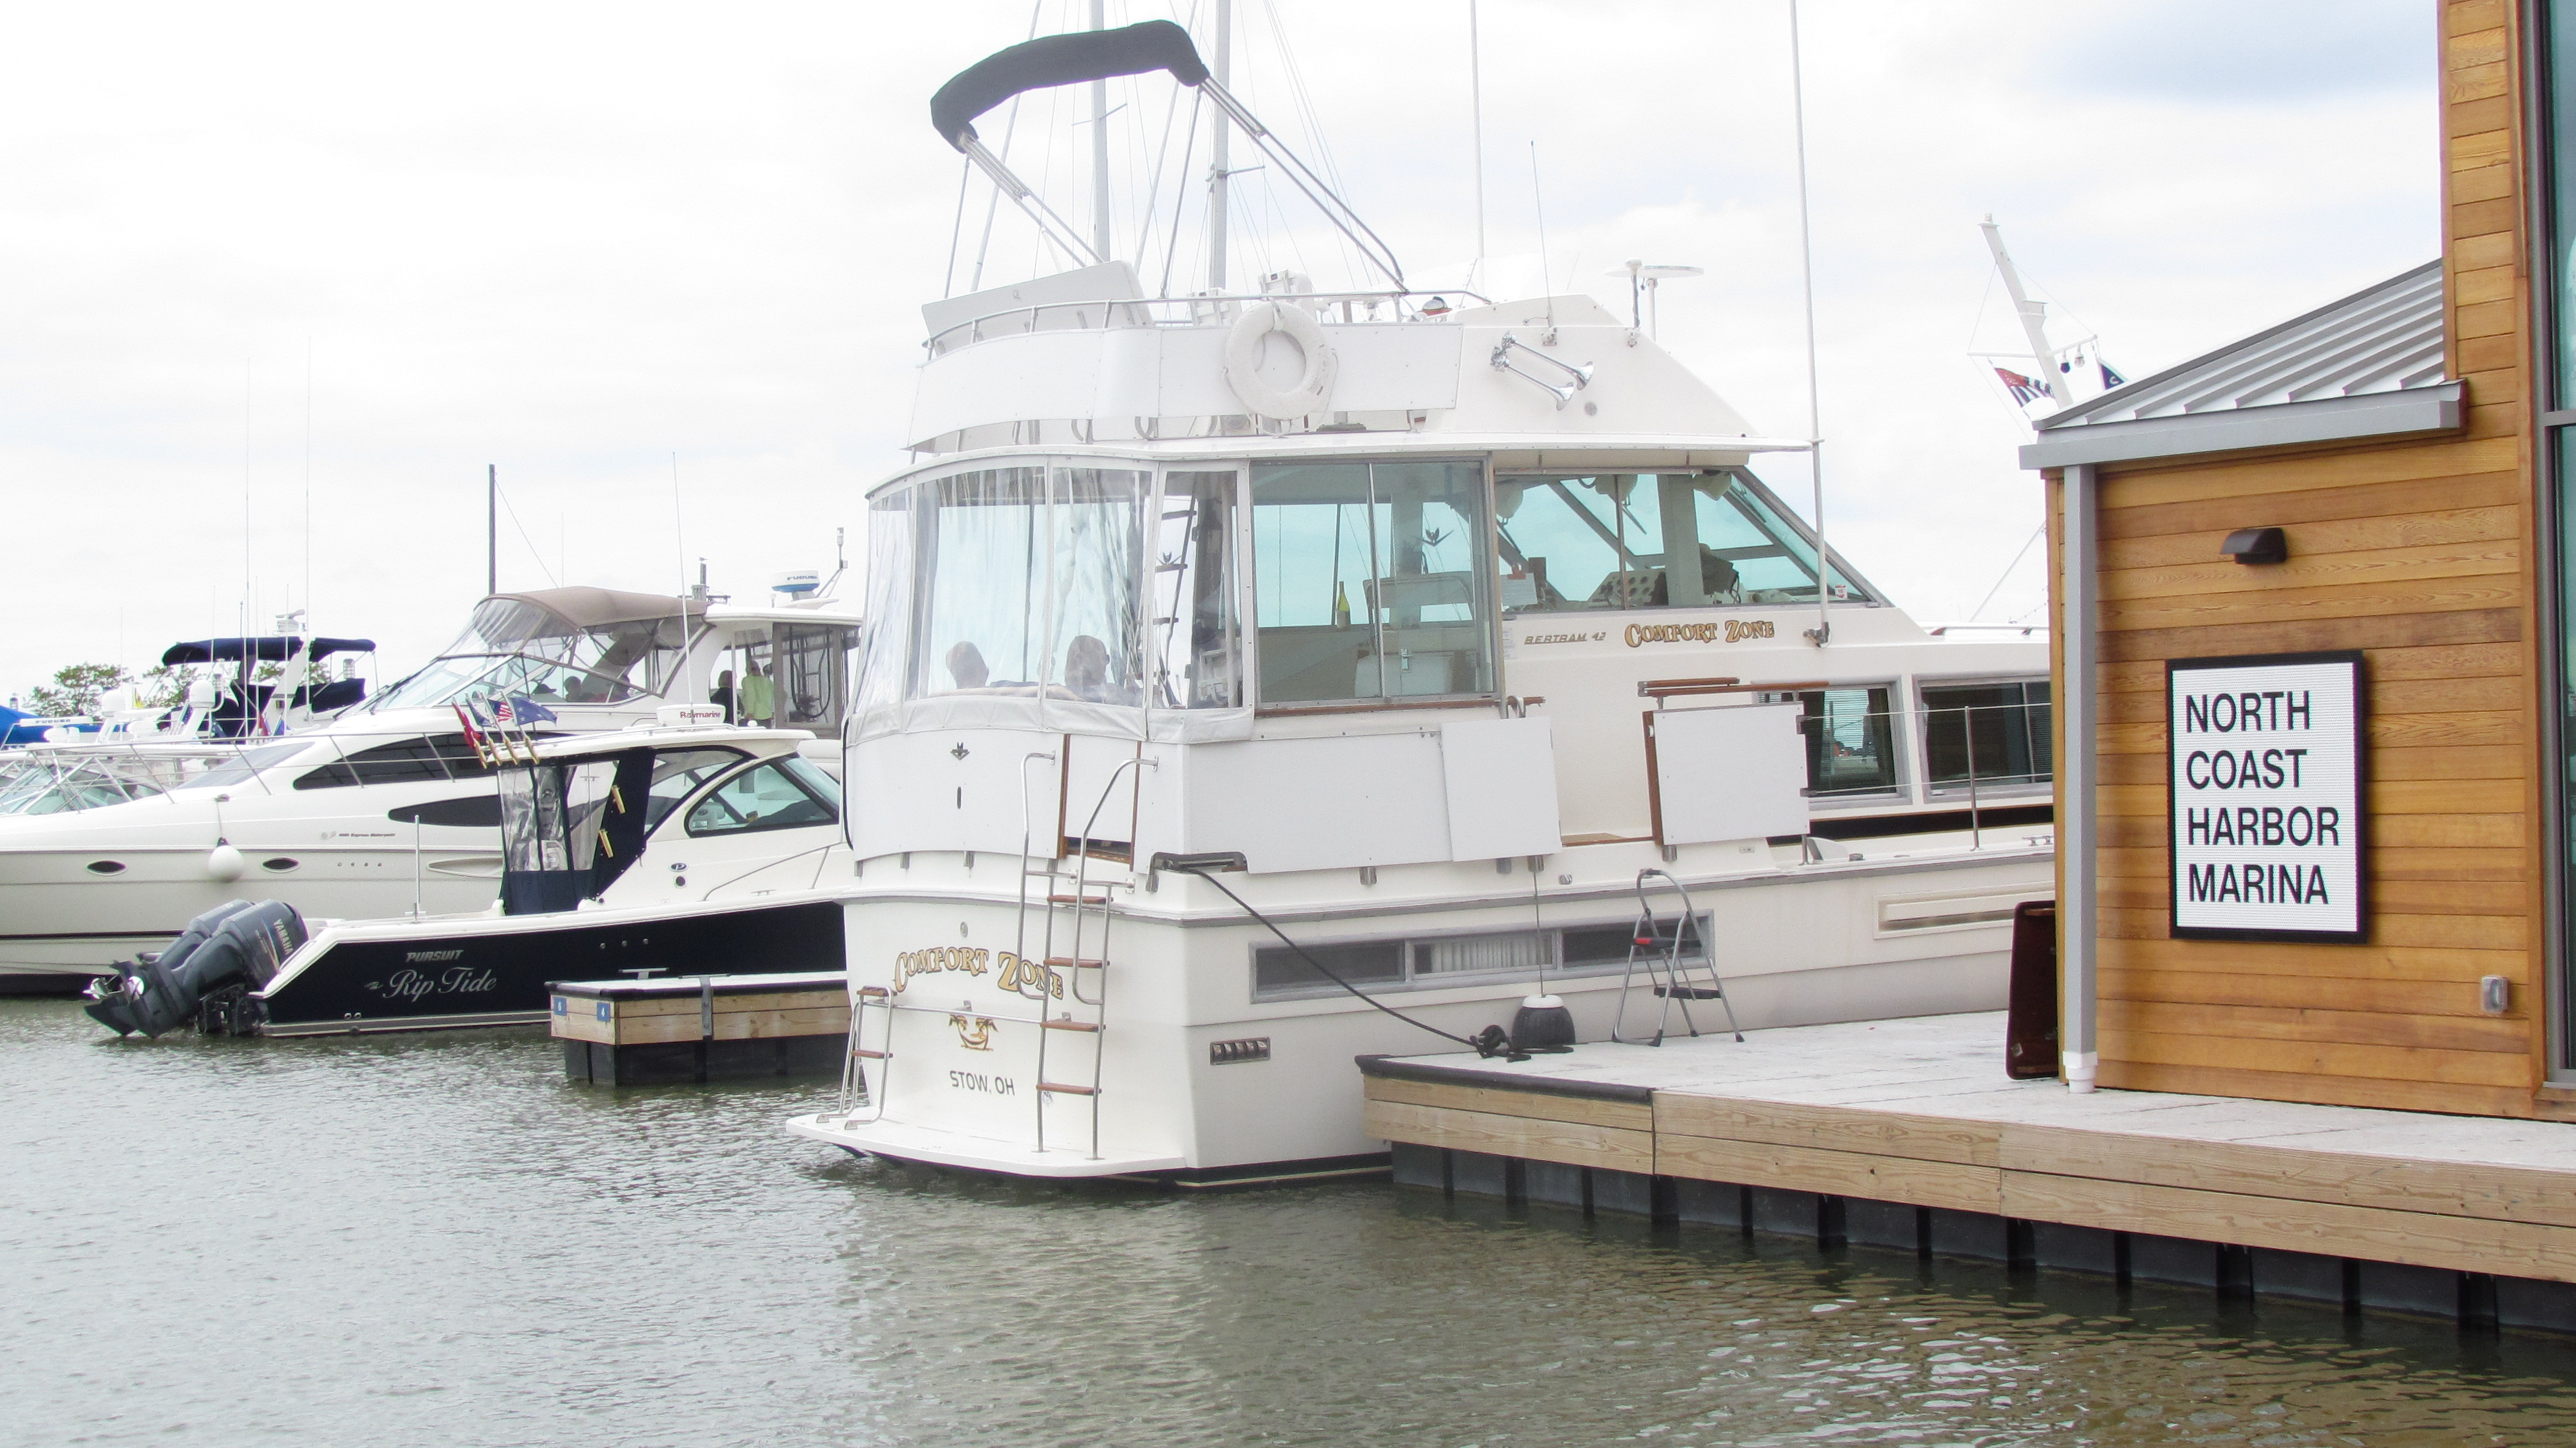 Oasis Marinas at North Coast boats docked | New Marinas Added | Snag-A-Slip